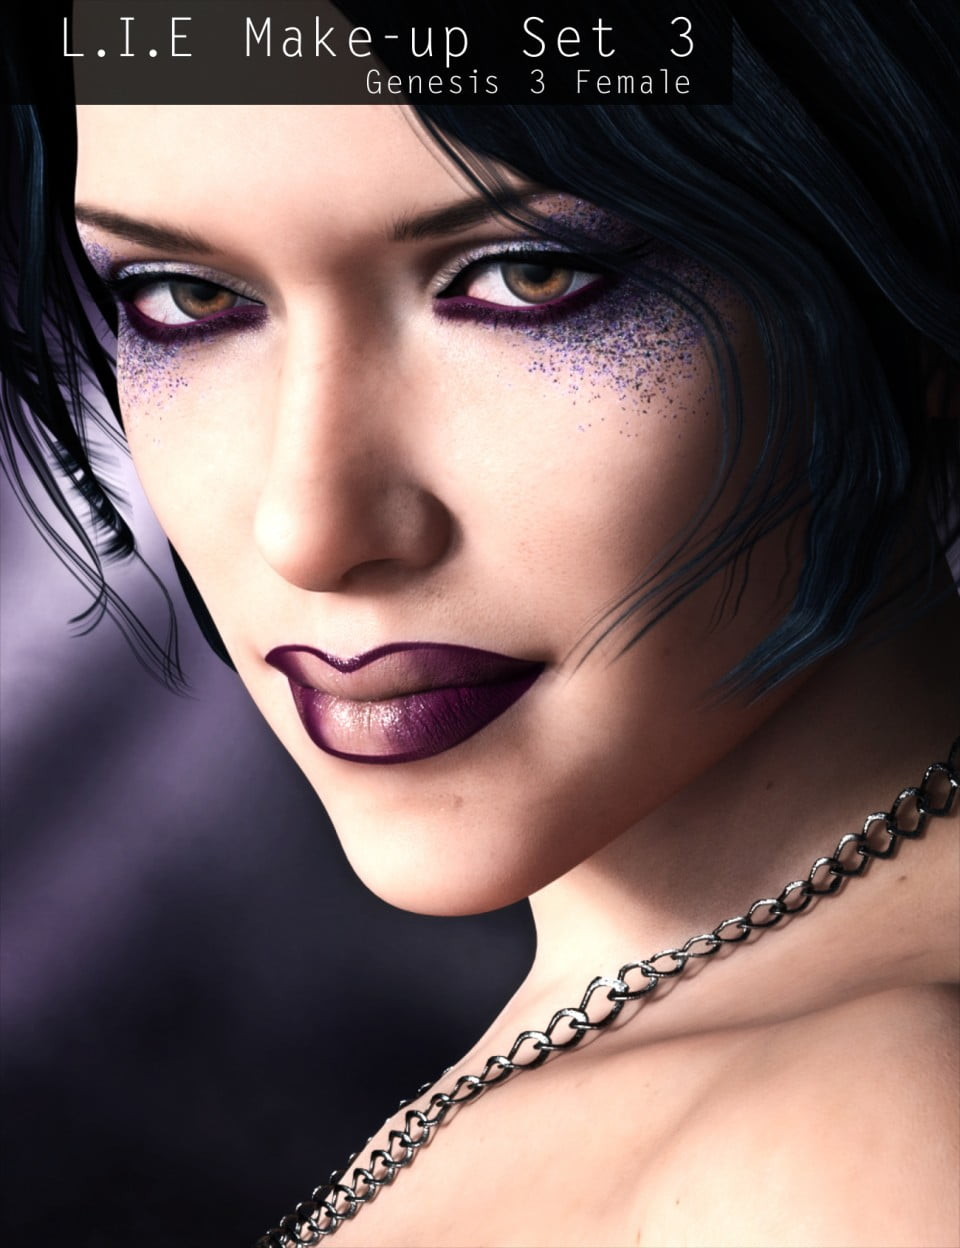 00-main-lie-make-up-set-3-for-genesis-3-females-daz3d1